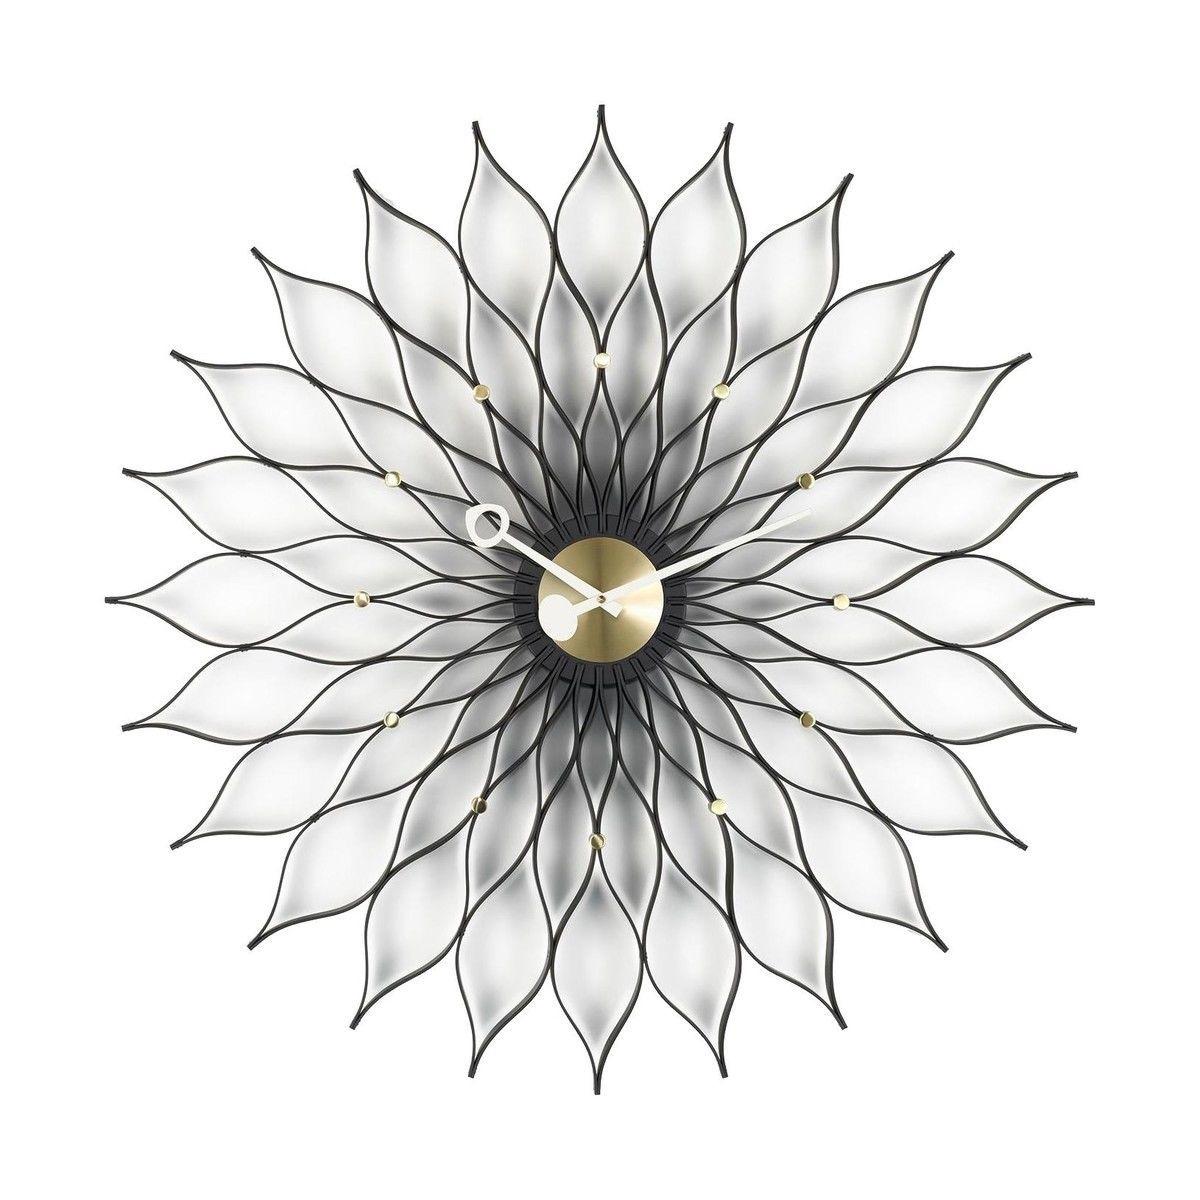 sunflower clock nelson  vitra  ambientedirectcom - vitra  sunflower clock nelson  brassblackØcm